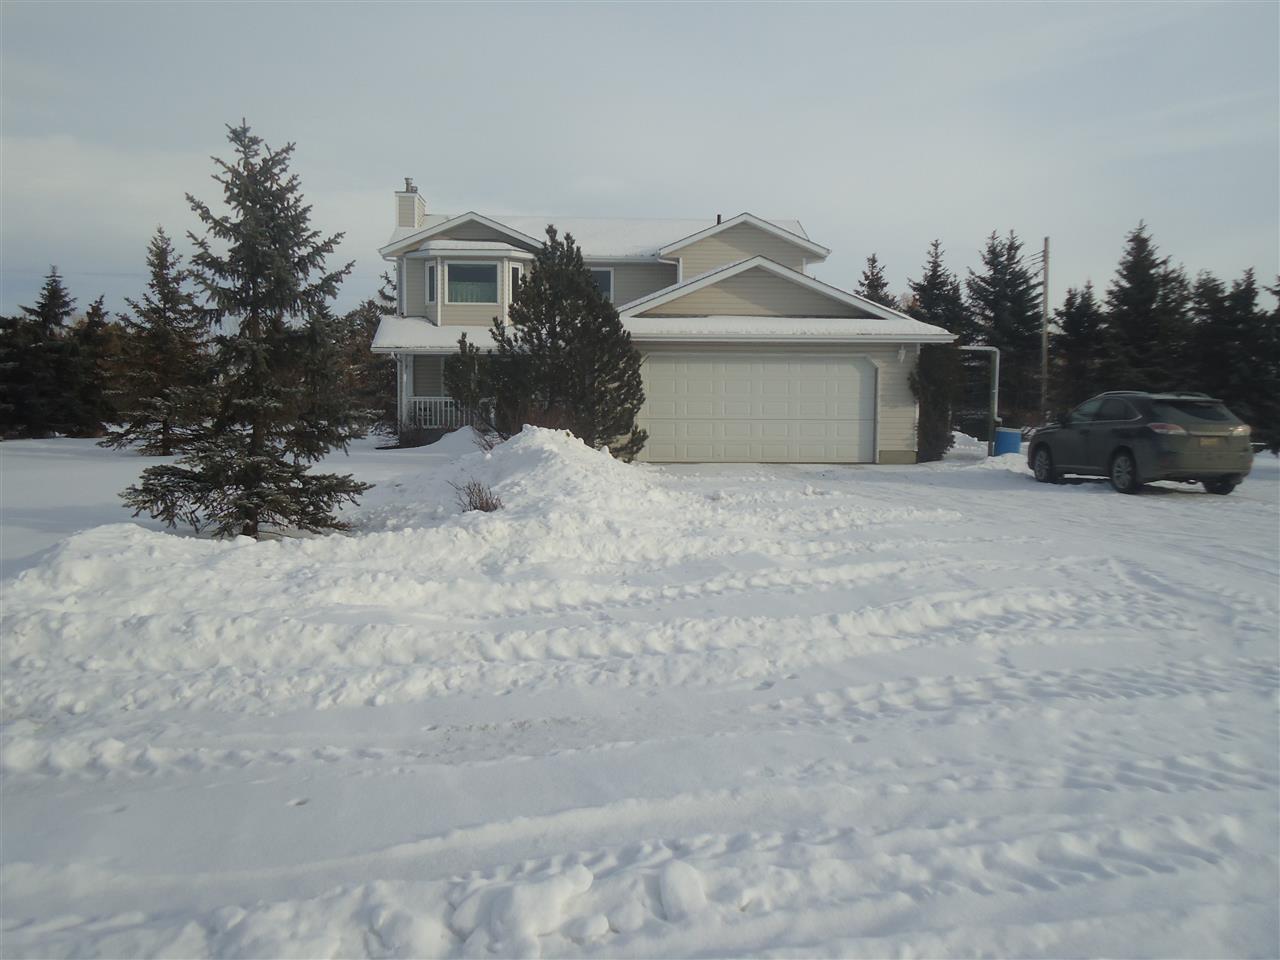 Main Photo: 12125 41 Avenue in Edmonton: Zone 55 Land Commercial for sale : MLS®# E4186952